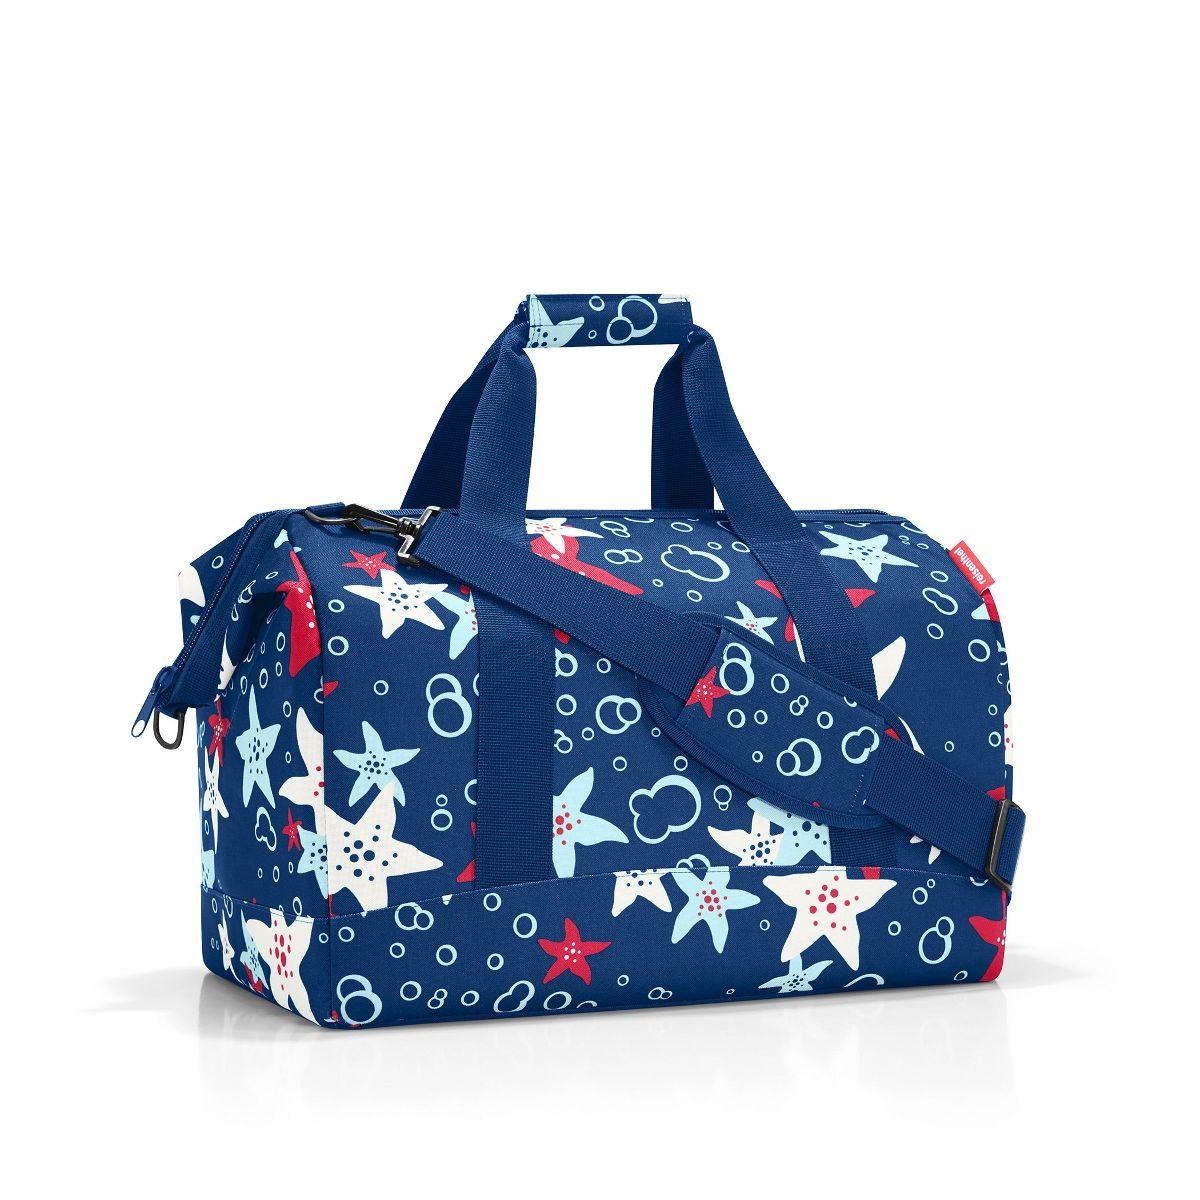 827e8bbcff1 Reisenthel Allrounder M Reistas Sporttas - Polyester - Maat M - 18L - Spots  Navy Blauw   Wishlist - Travel bags, Travel en Bags